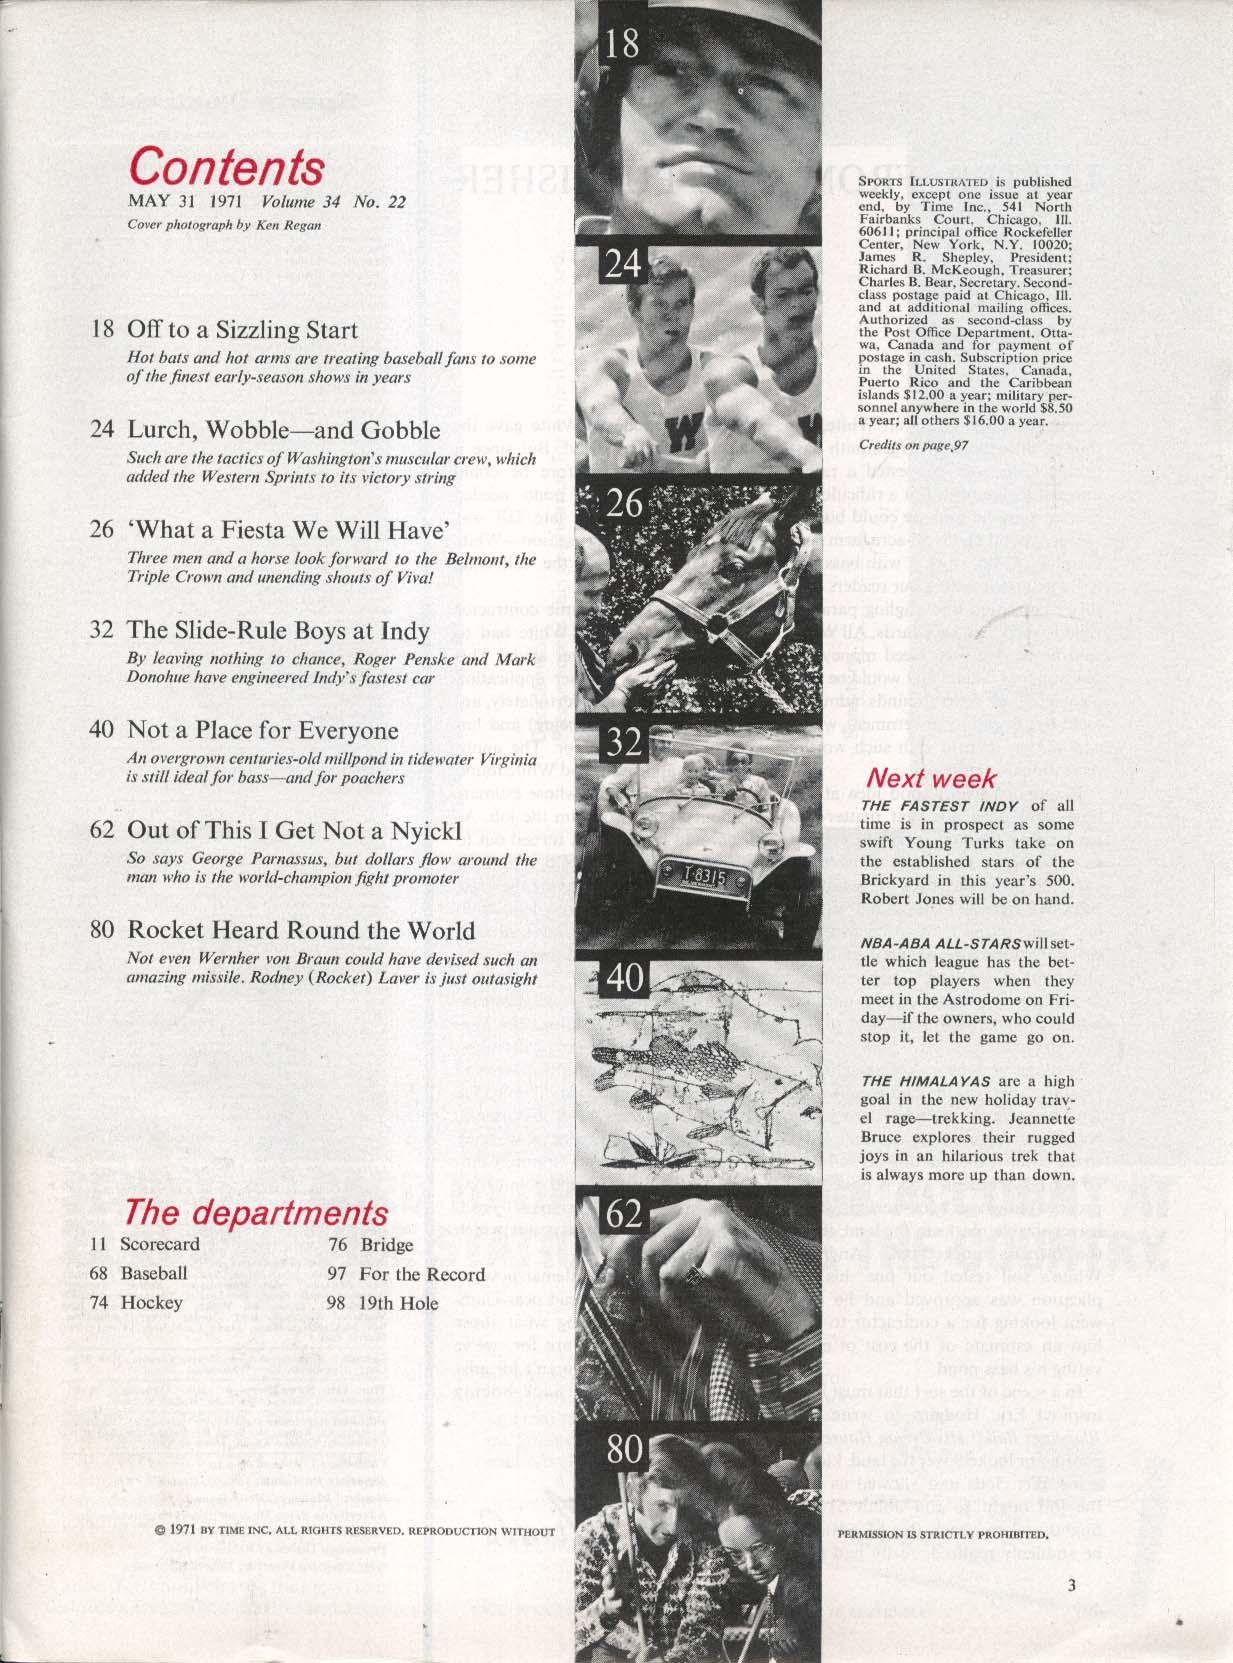 SPORTS ILLUSTRATED Vida Blue Roger Penske Mark Donohue Rodney Laver 5/31 1971